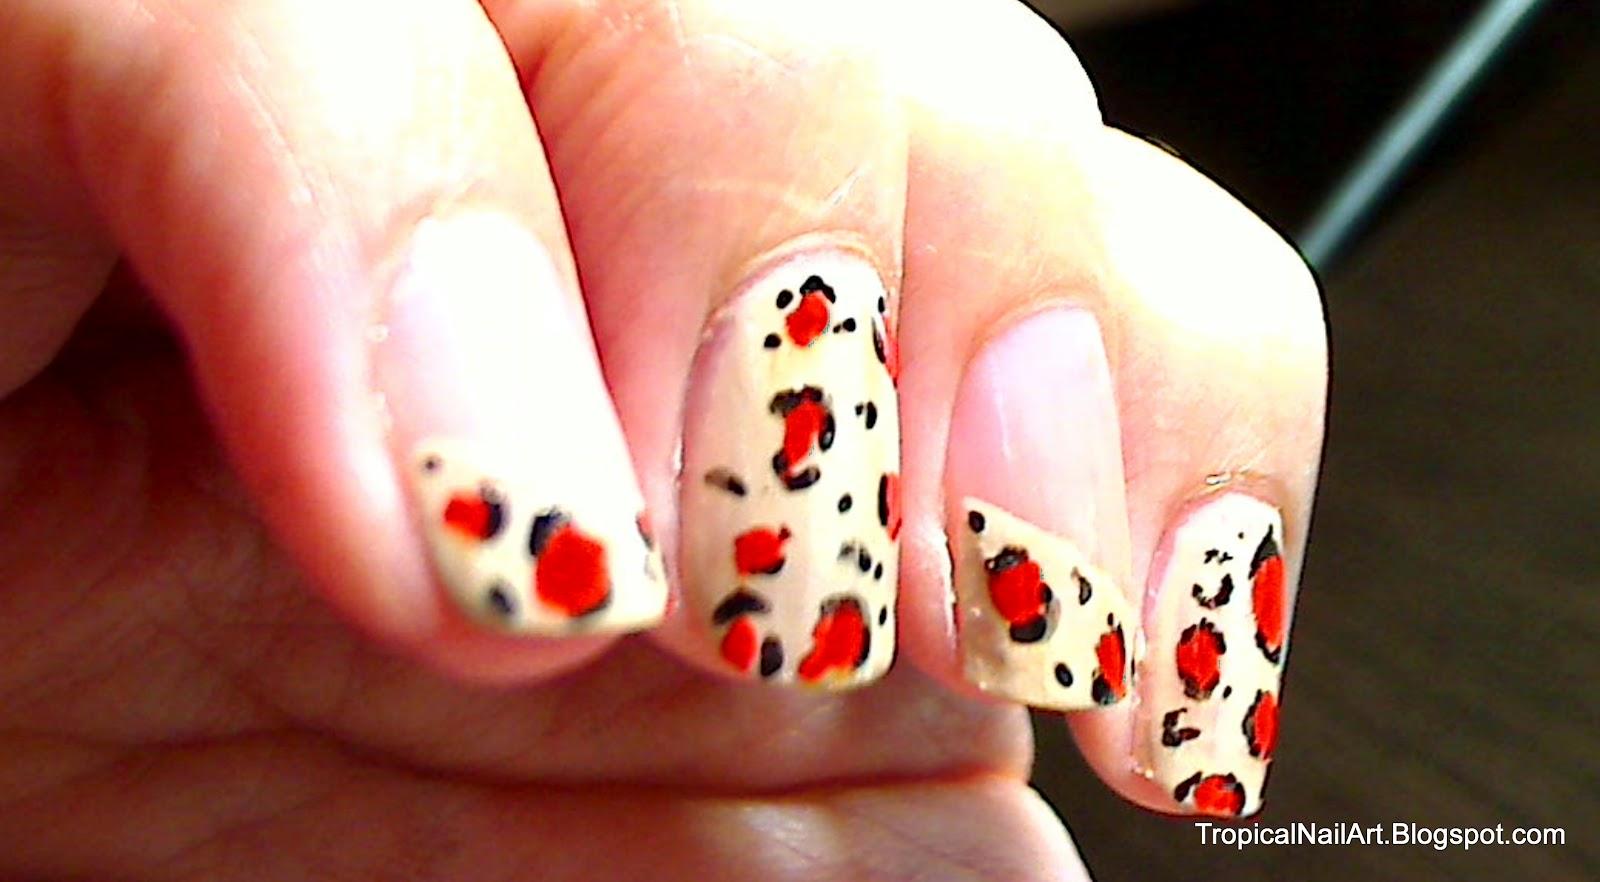 Tropical Nail Art: Leopard Print Mani